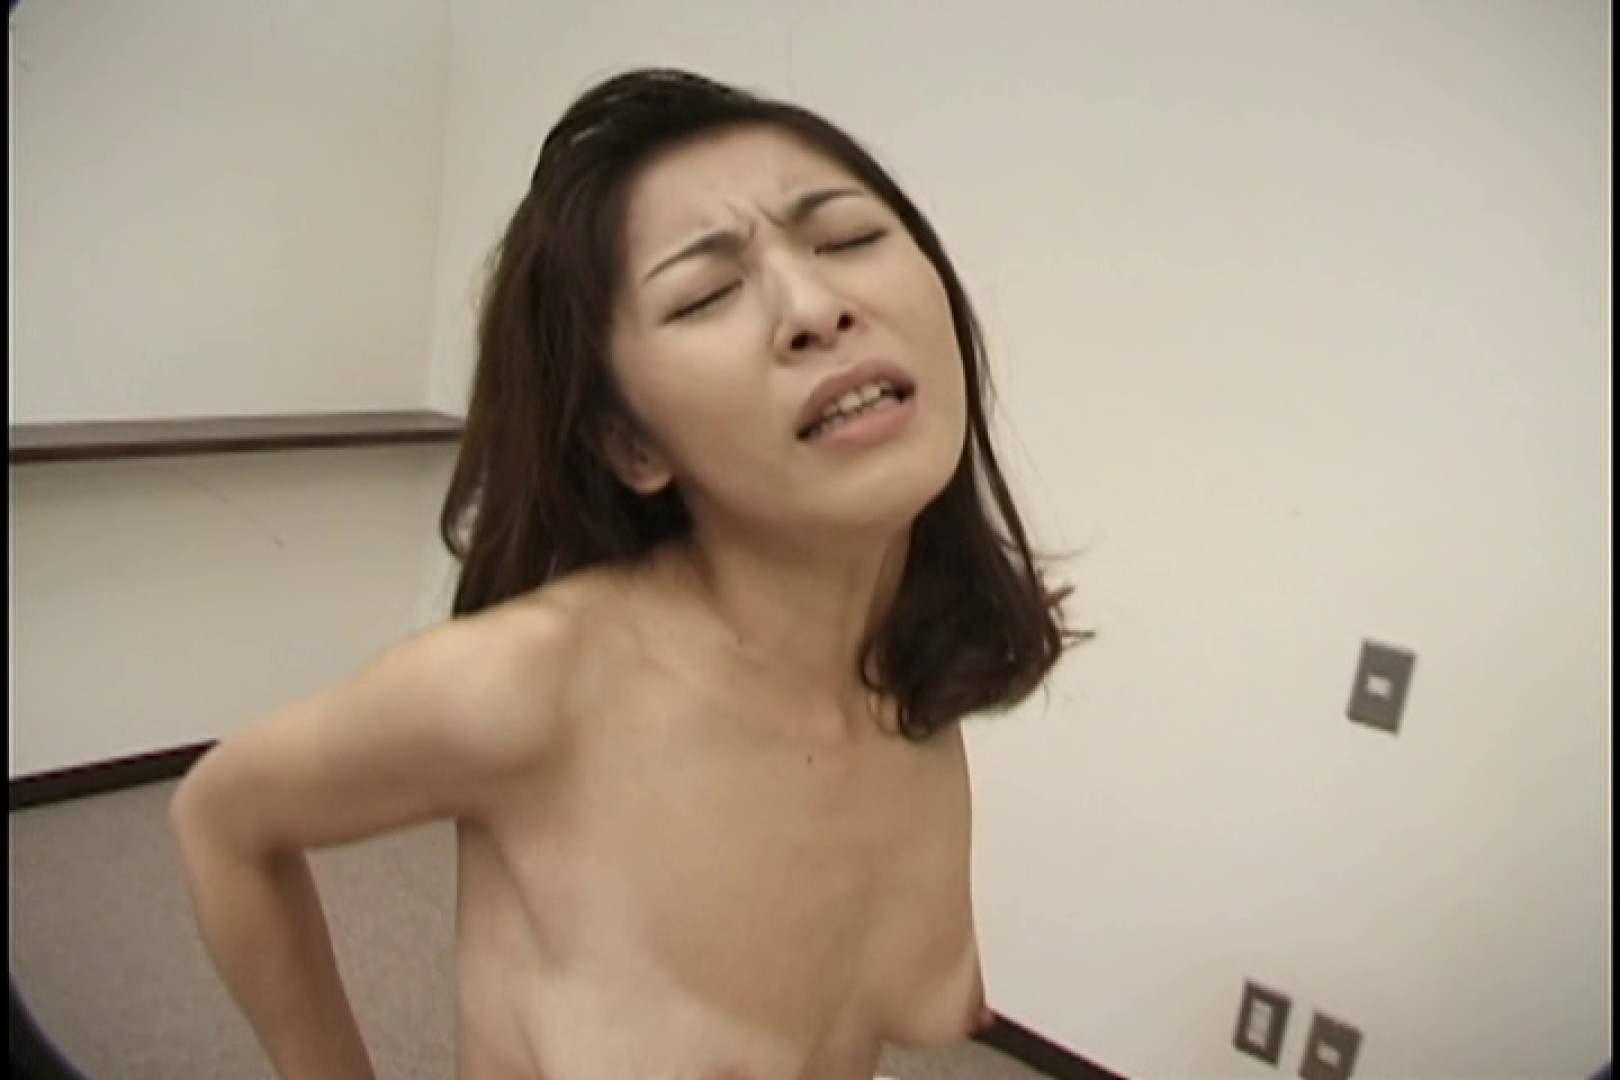 昼間の奥様は欲求不満 ~安田弘美~ SEX 性交動画流出 13pic 13